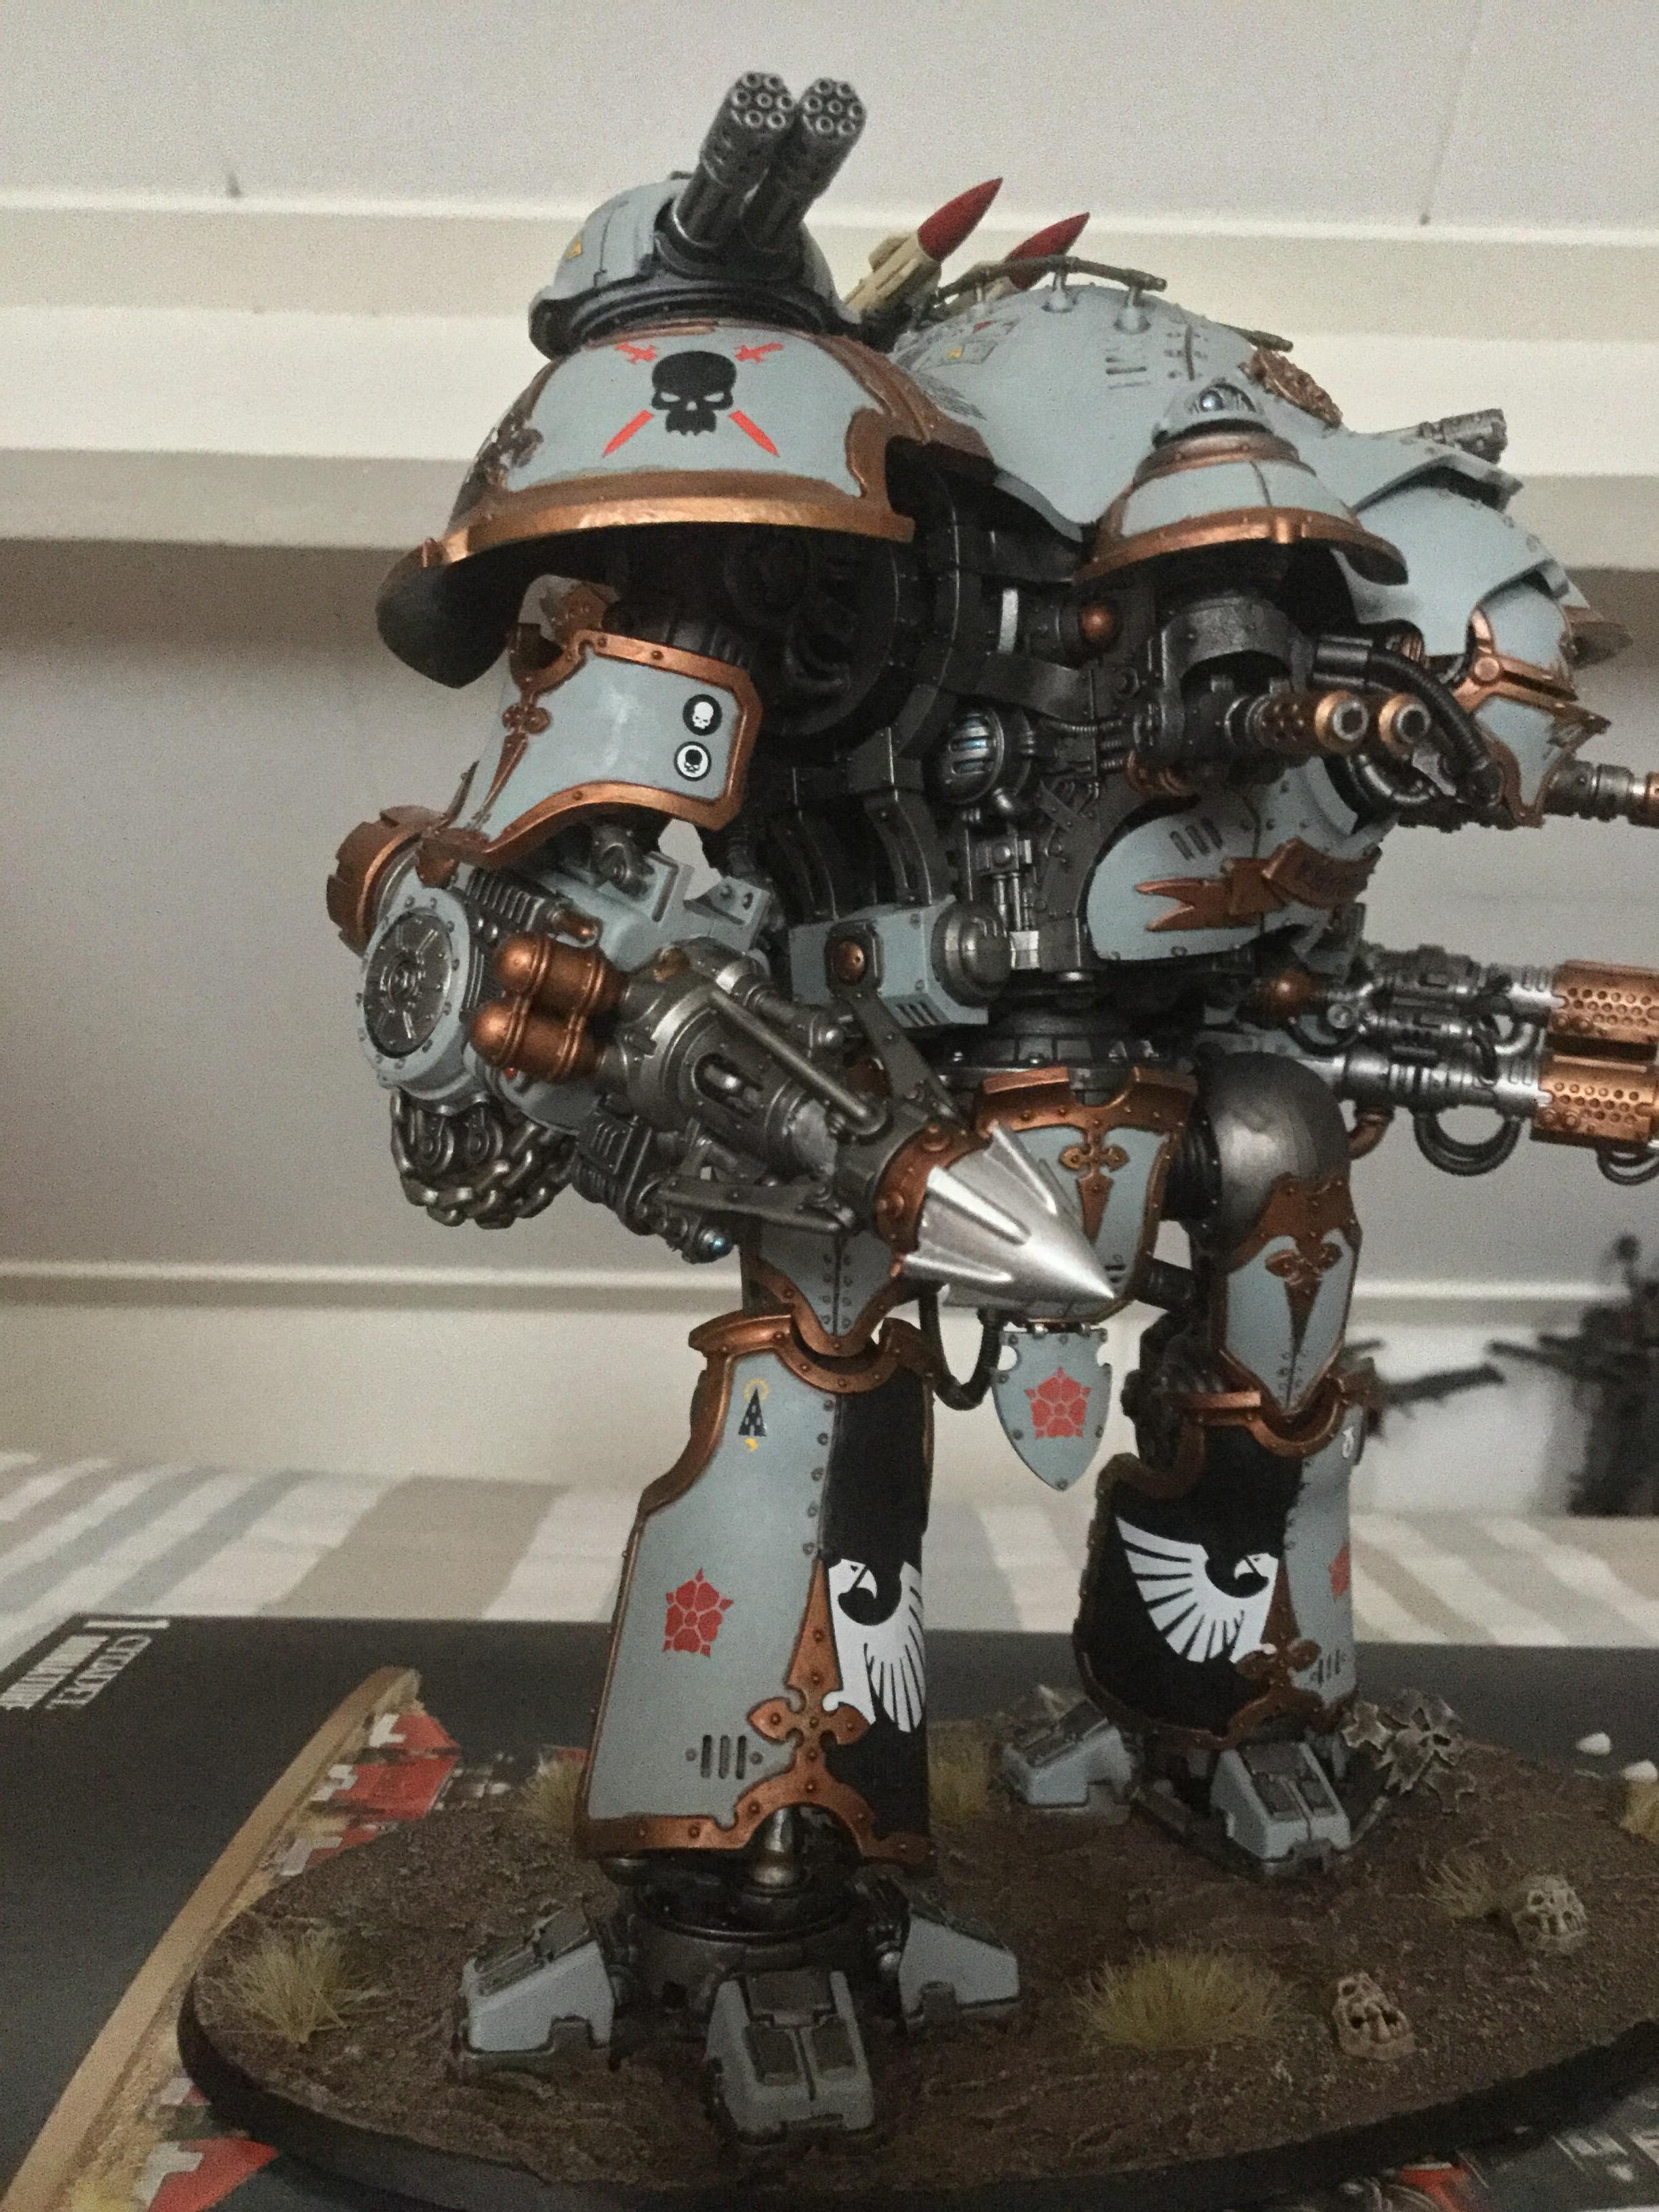 Dominus, Freeblade, Imperial Knight, Valiant, Warhammer 40,000